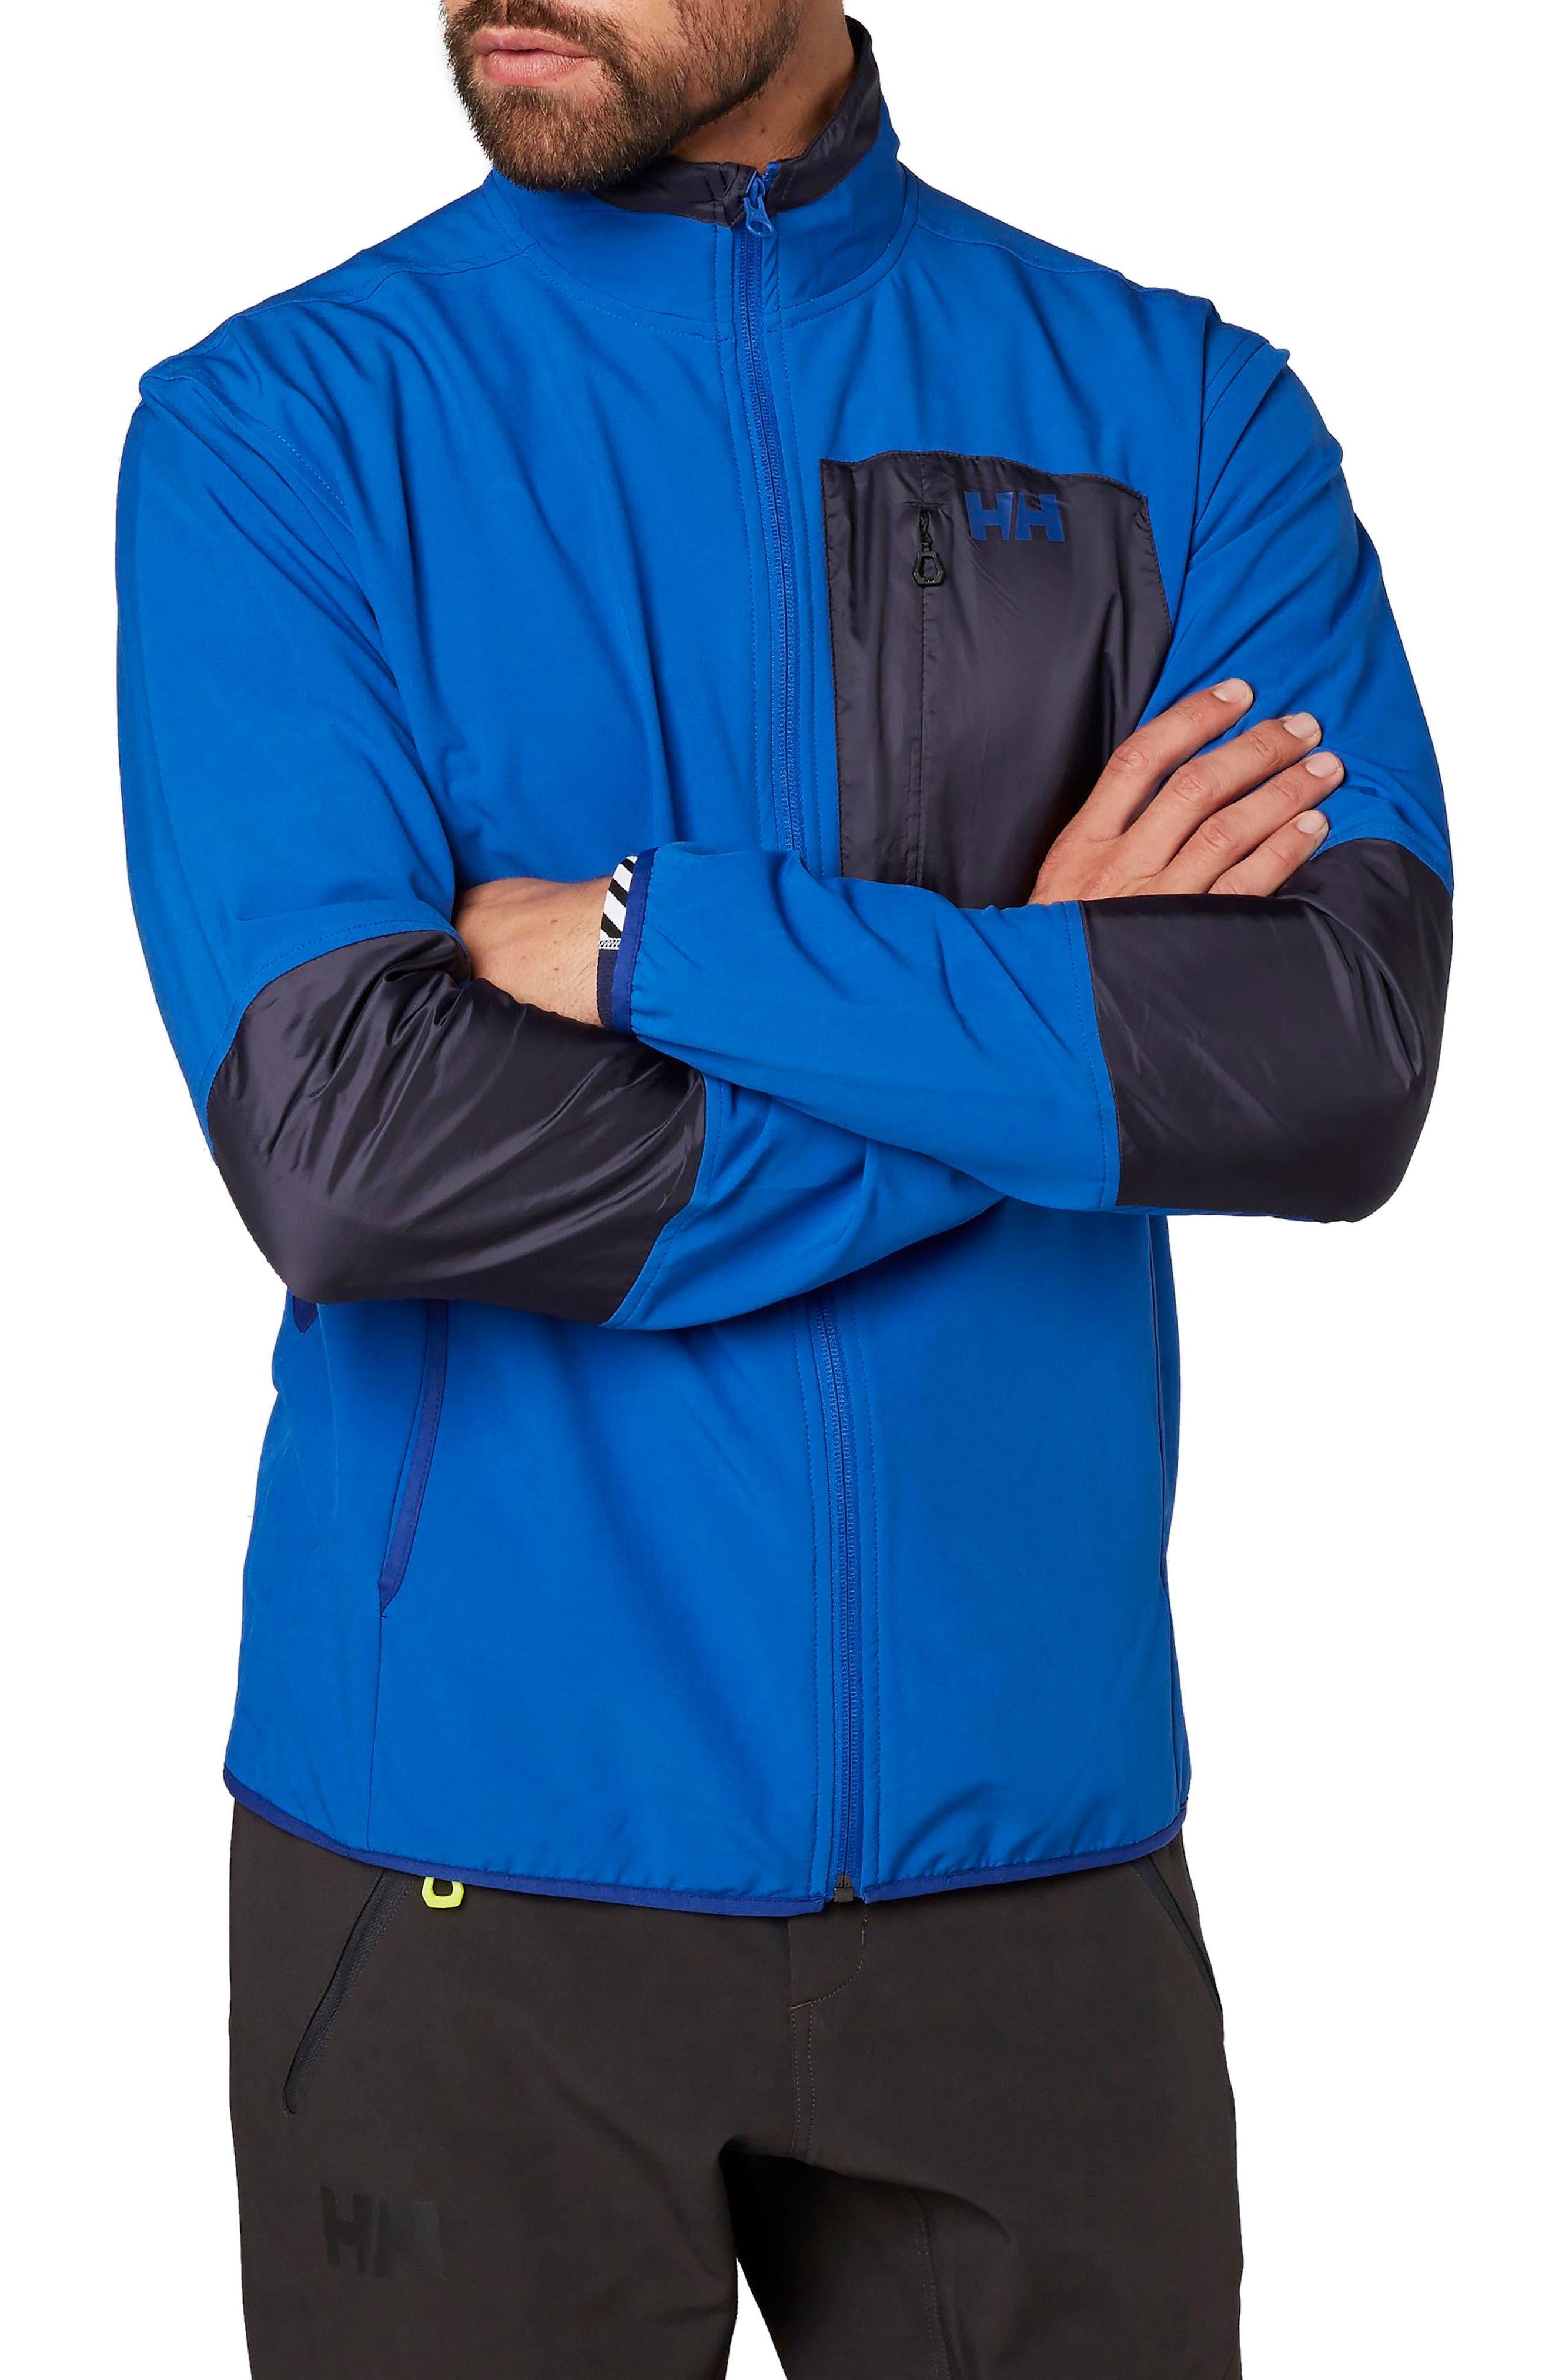 Wynn Rask Soft Shell Jacket,                         Main,                         color, Olympian Blue